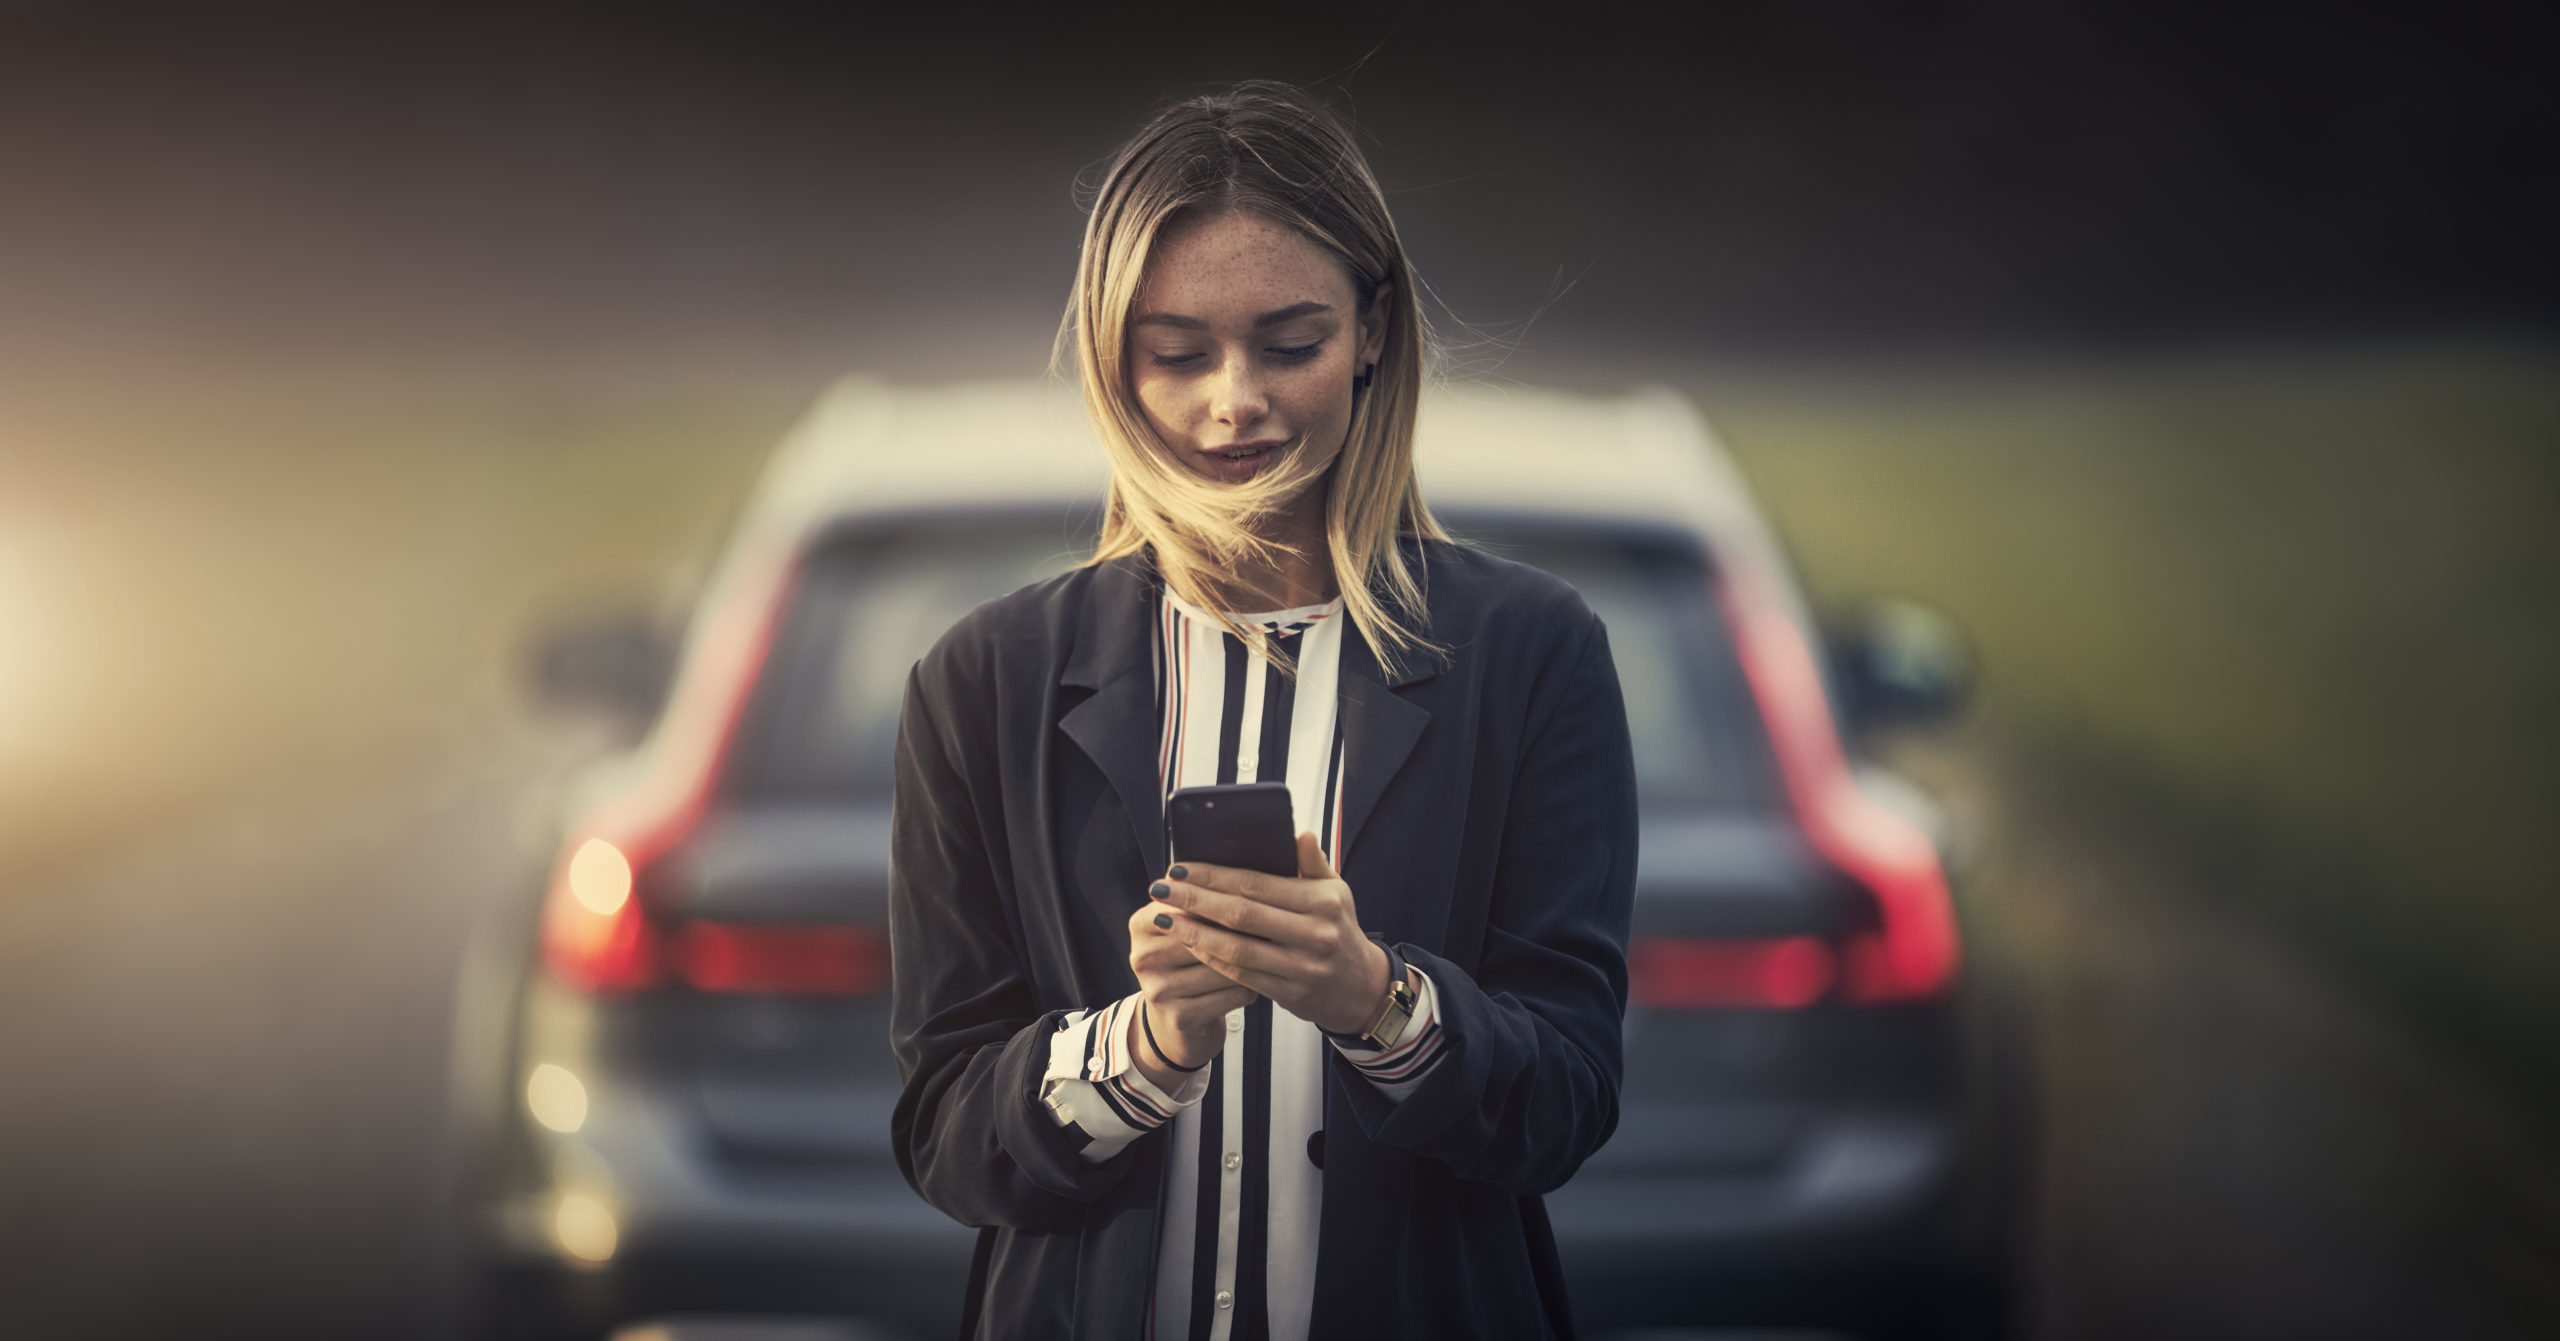 Volvo kobieta telefon